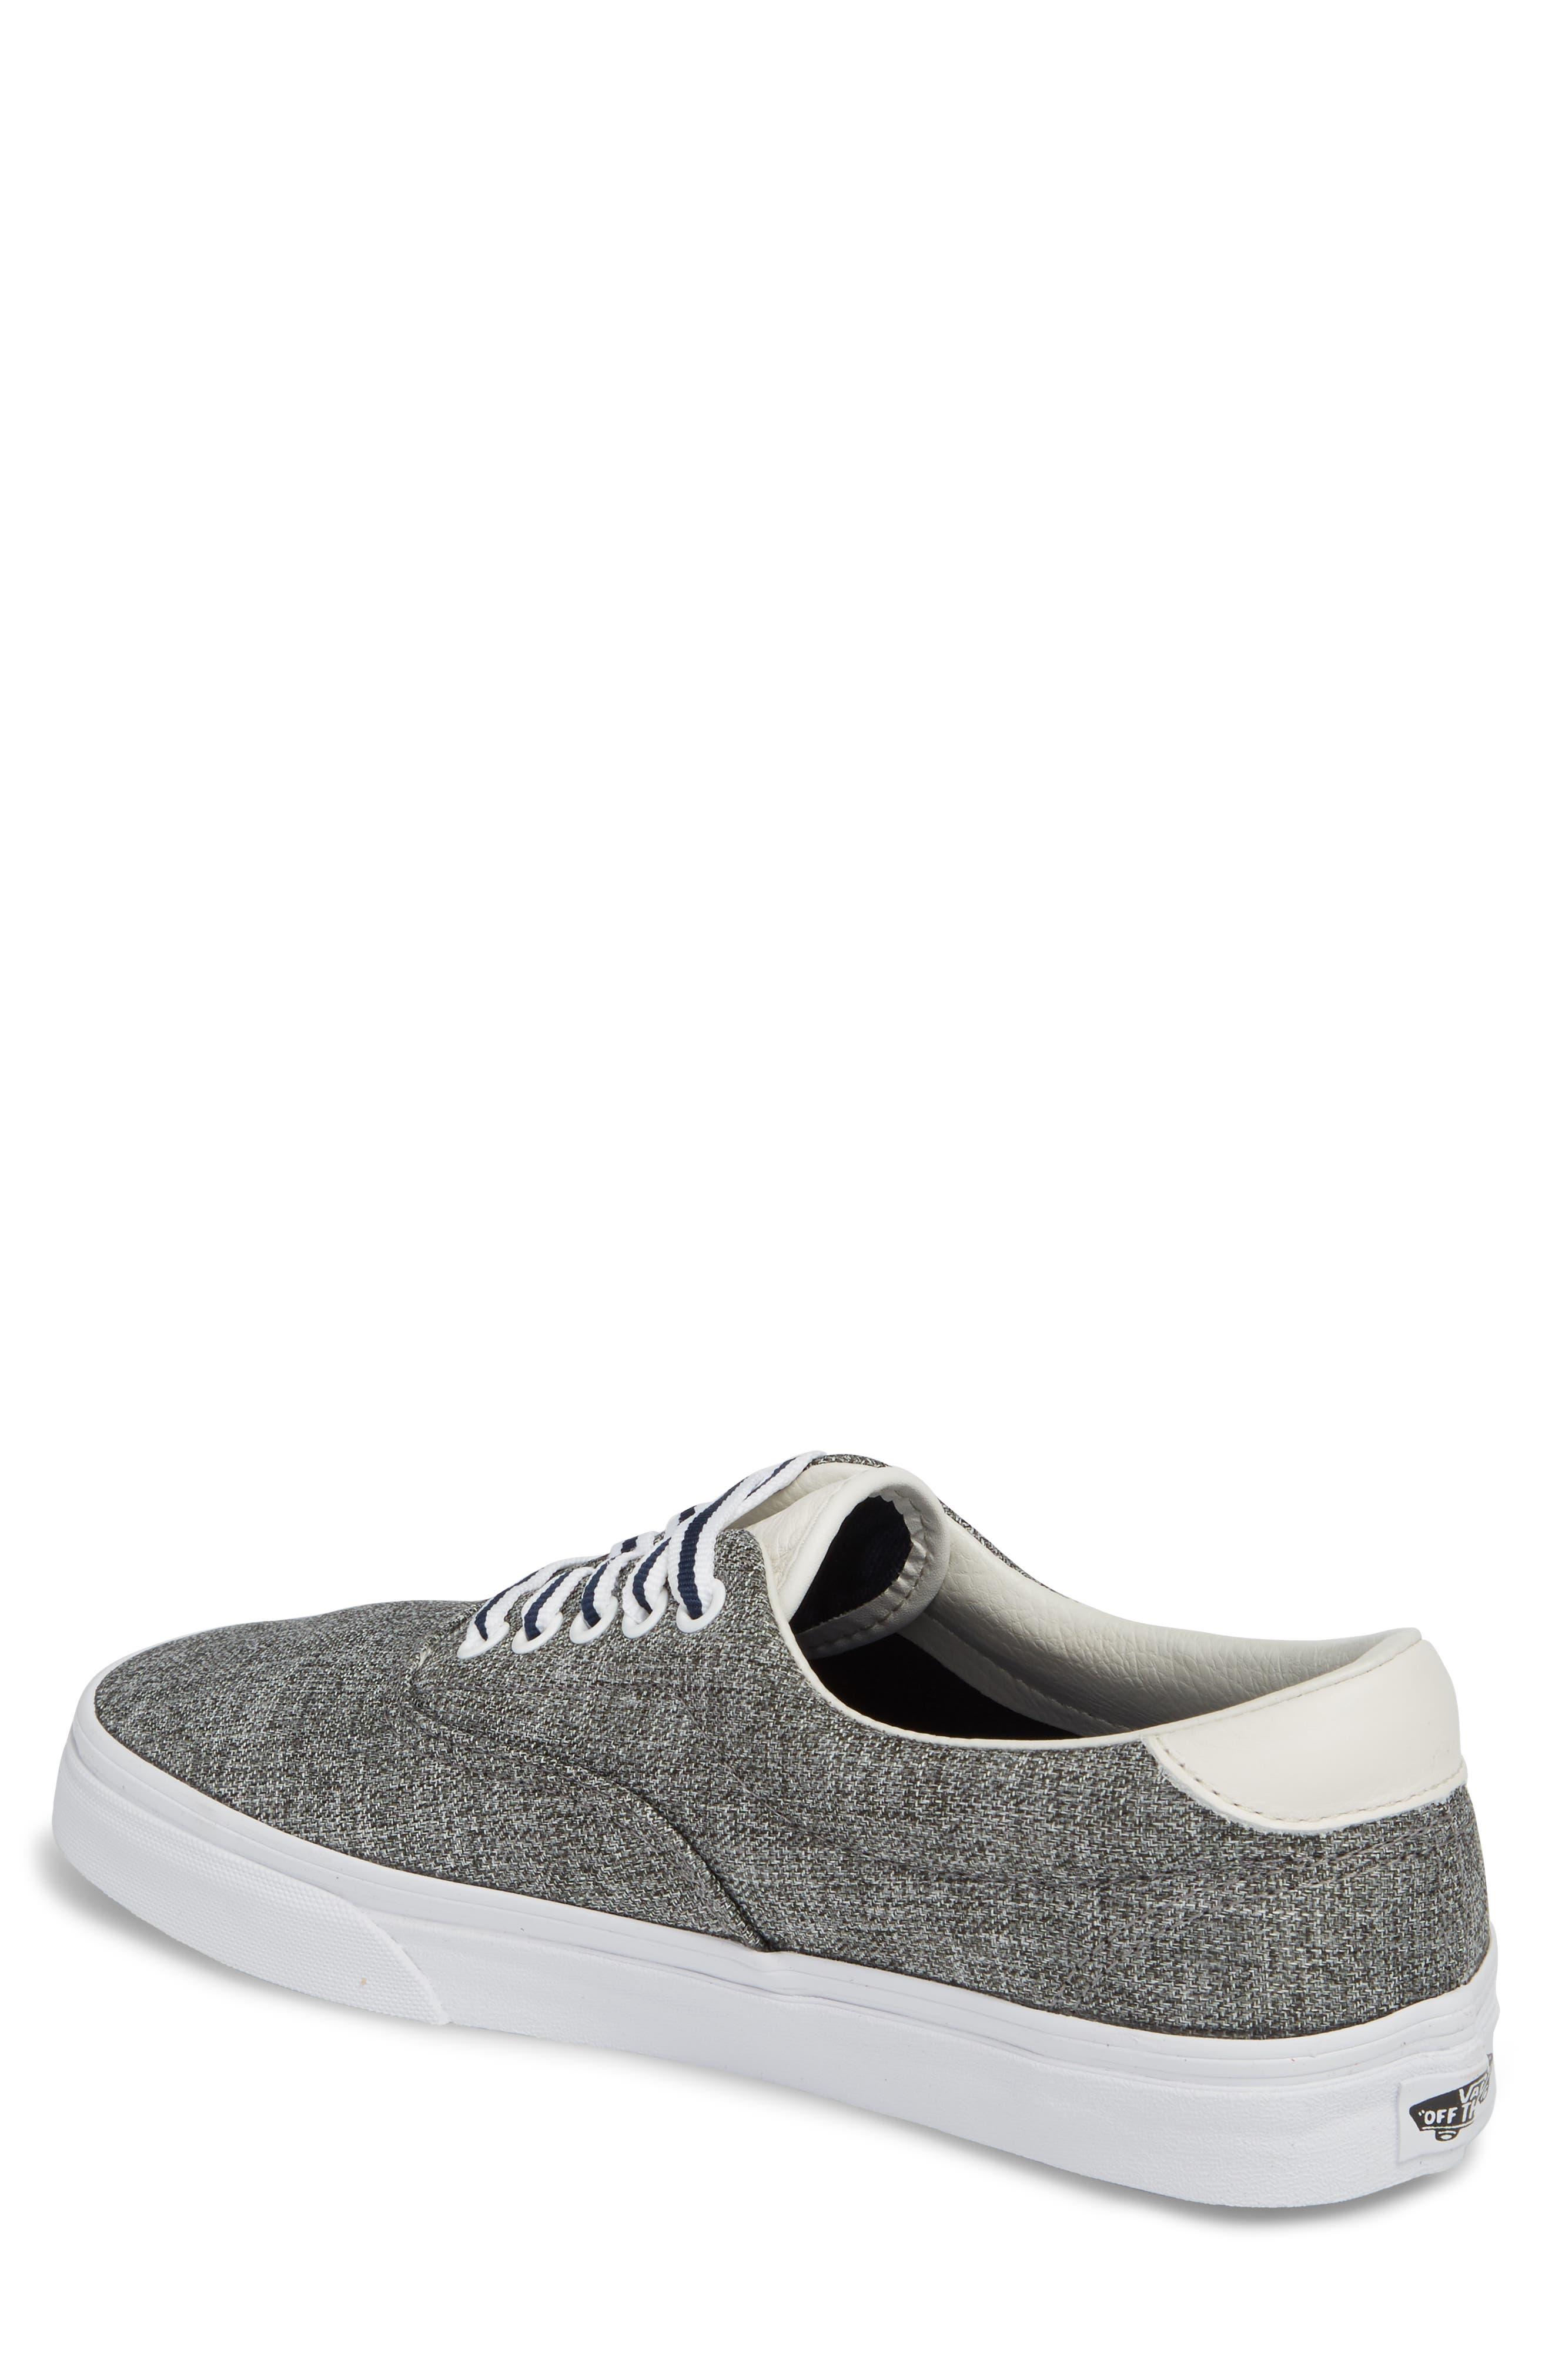 'Era 59' Sneaker,                             Alternate thumbnail 2, color,                             022